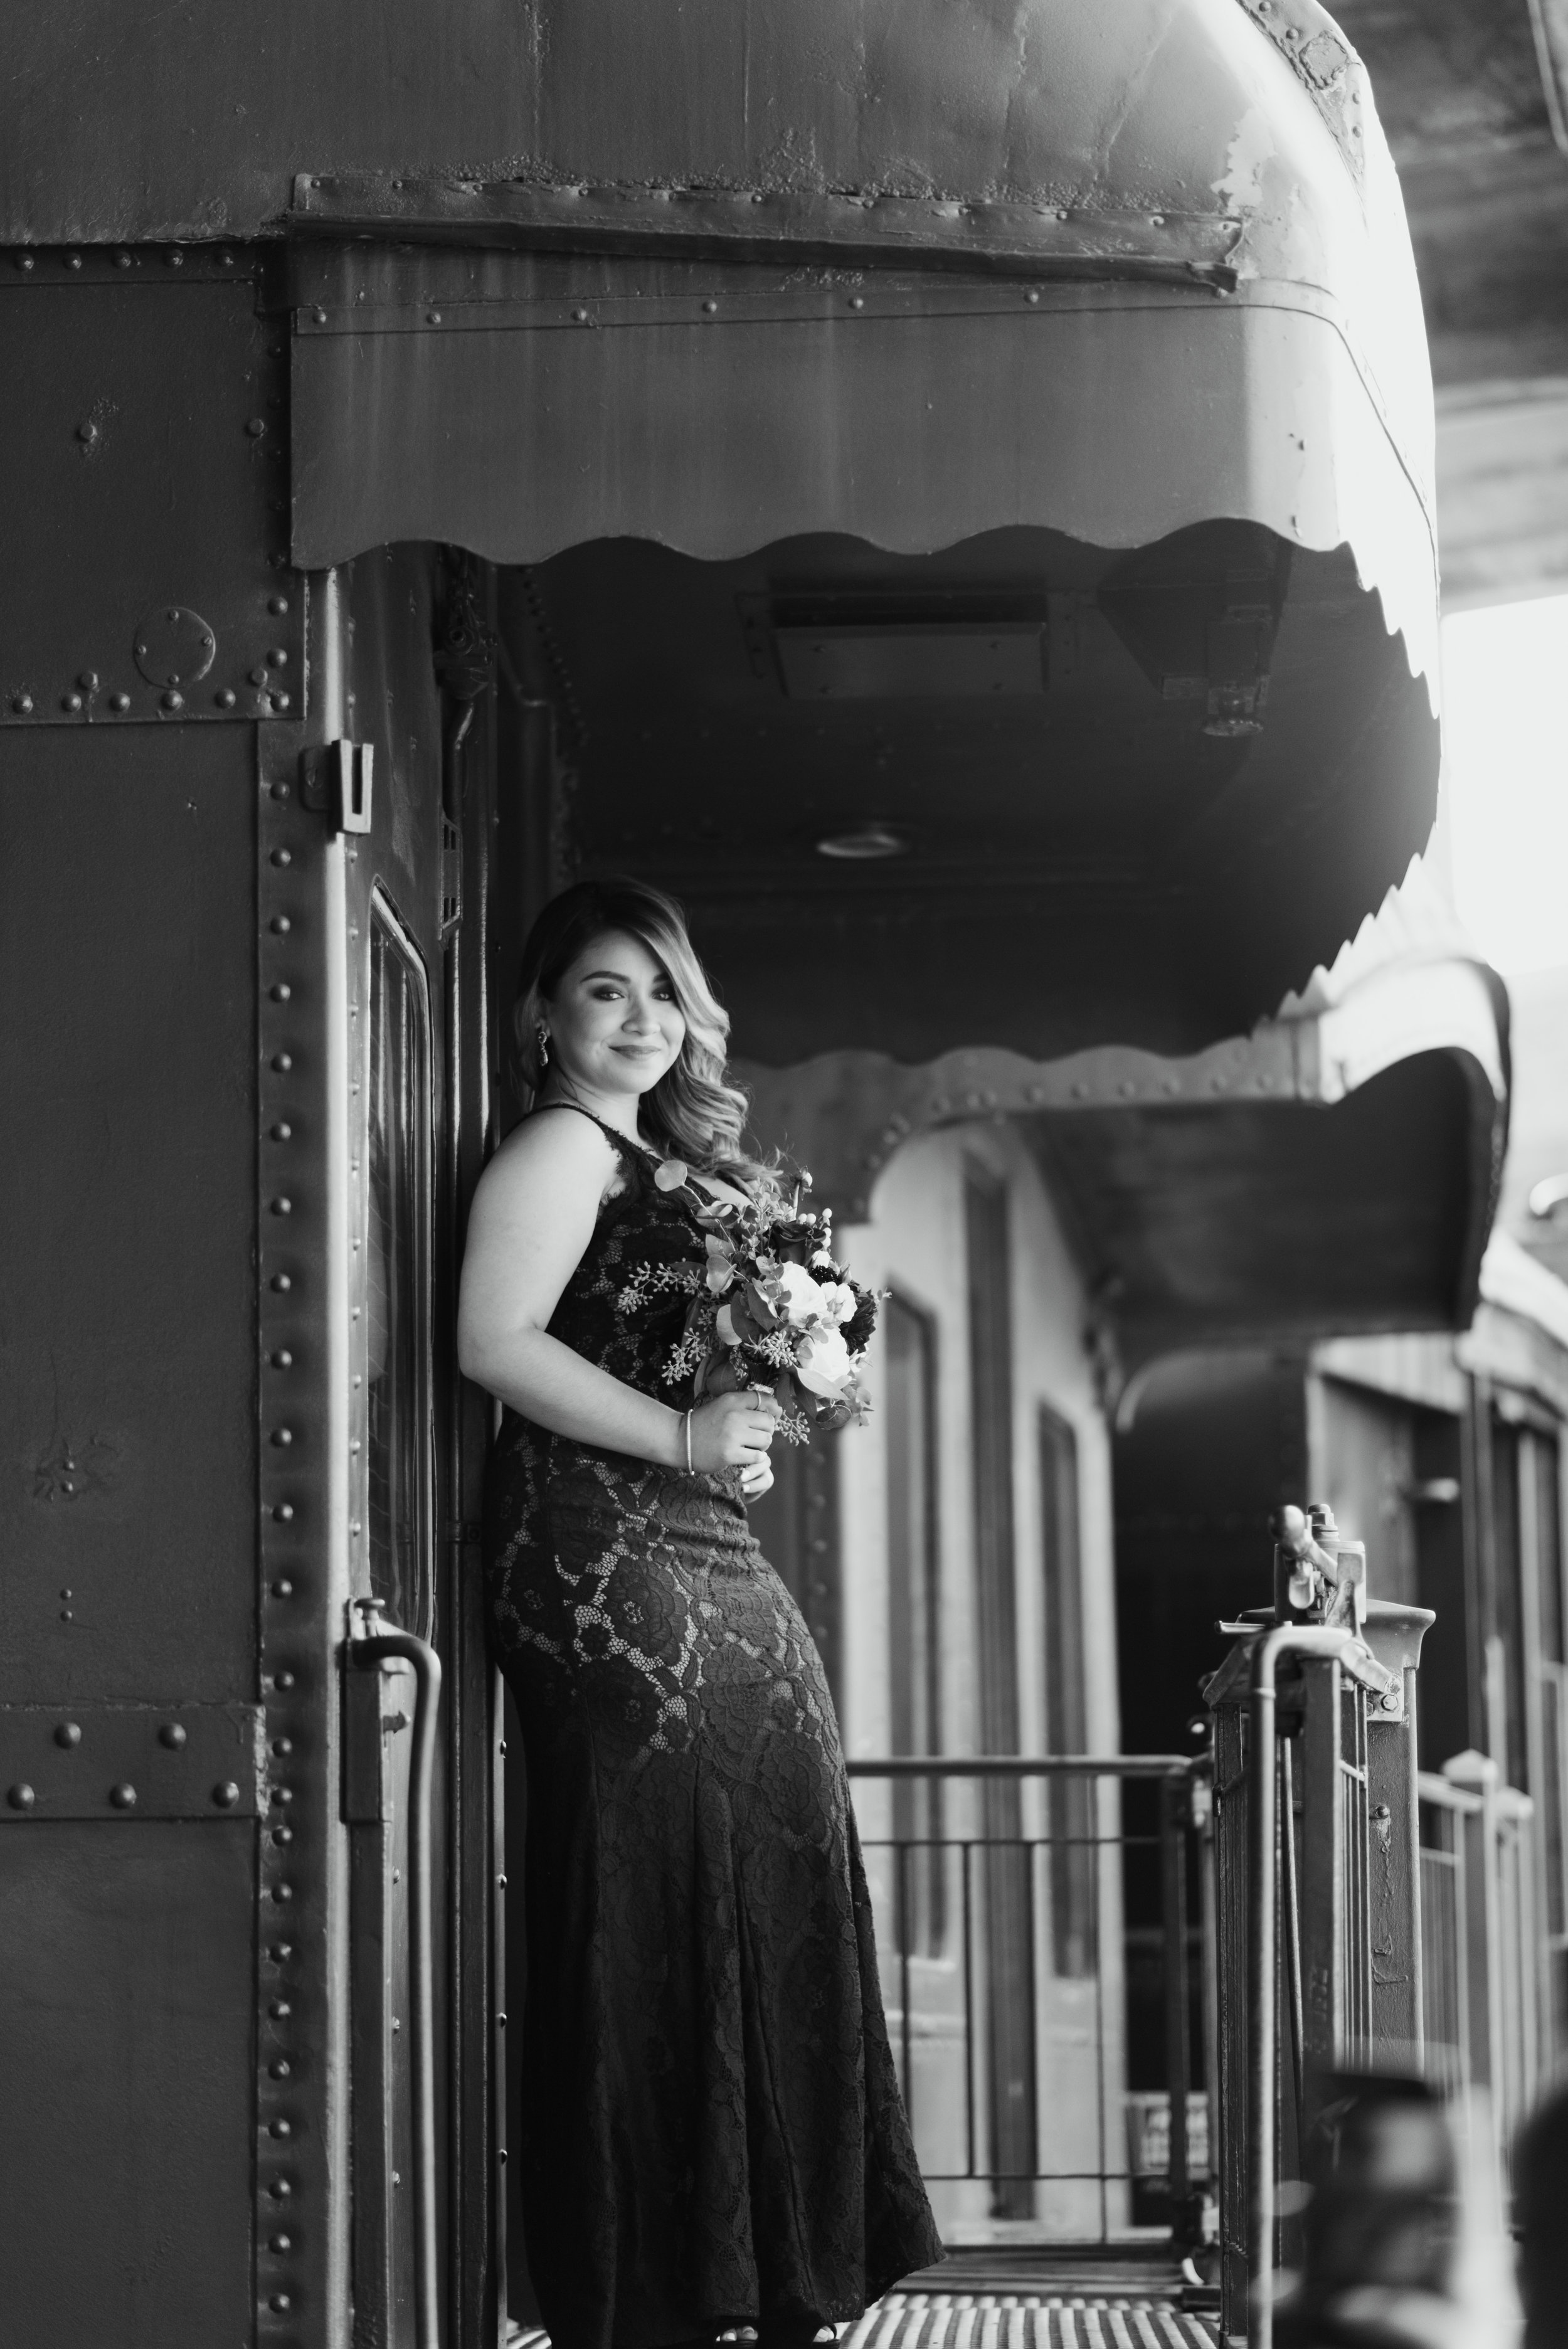 Iggy-and-yesenia-savannah-railroad-museum-wedding-meg-hill-photo- (351 of 1037).jpg